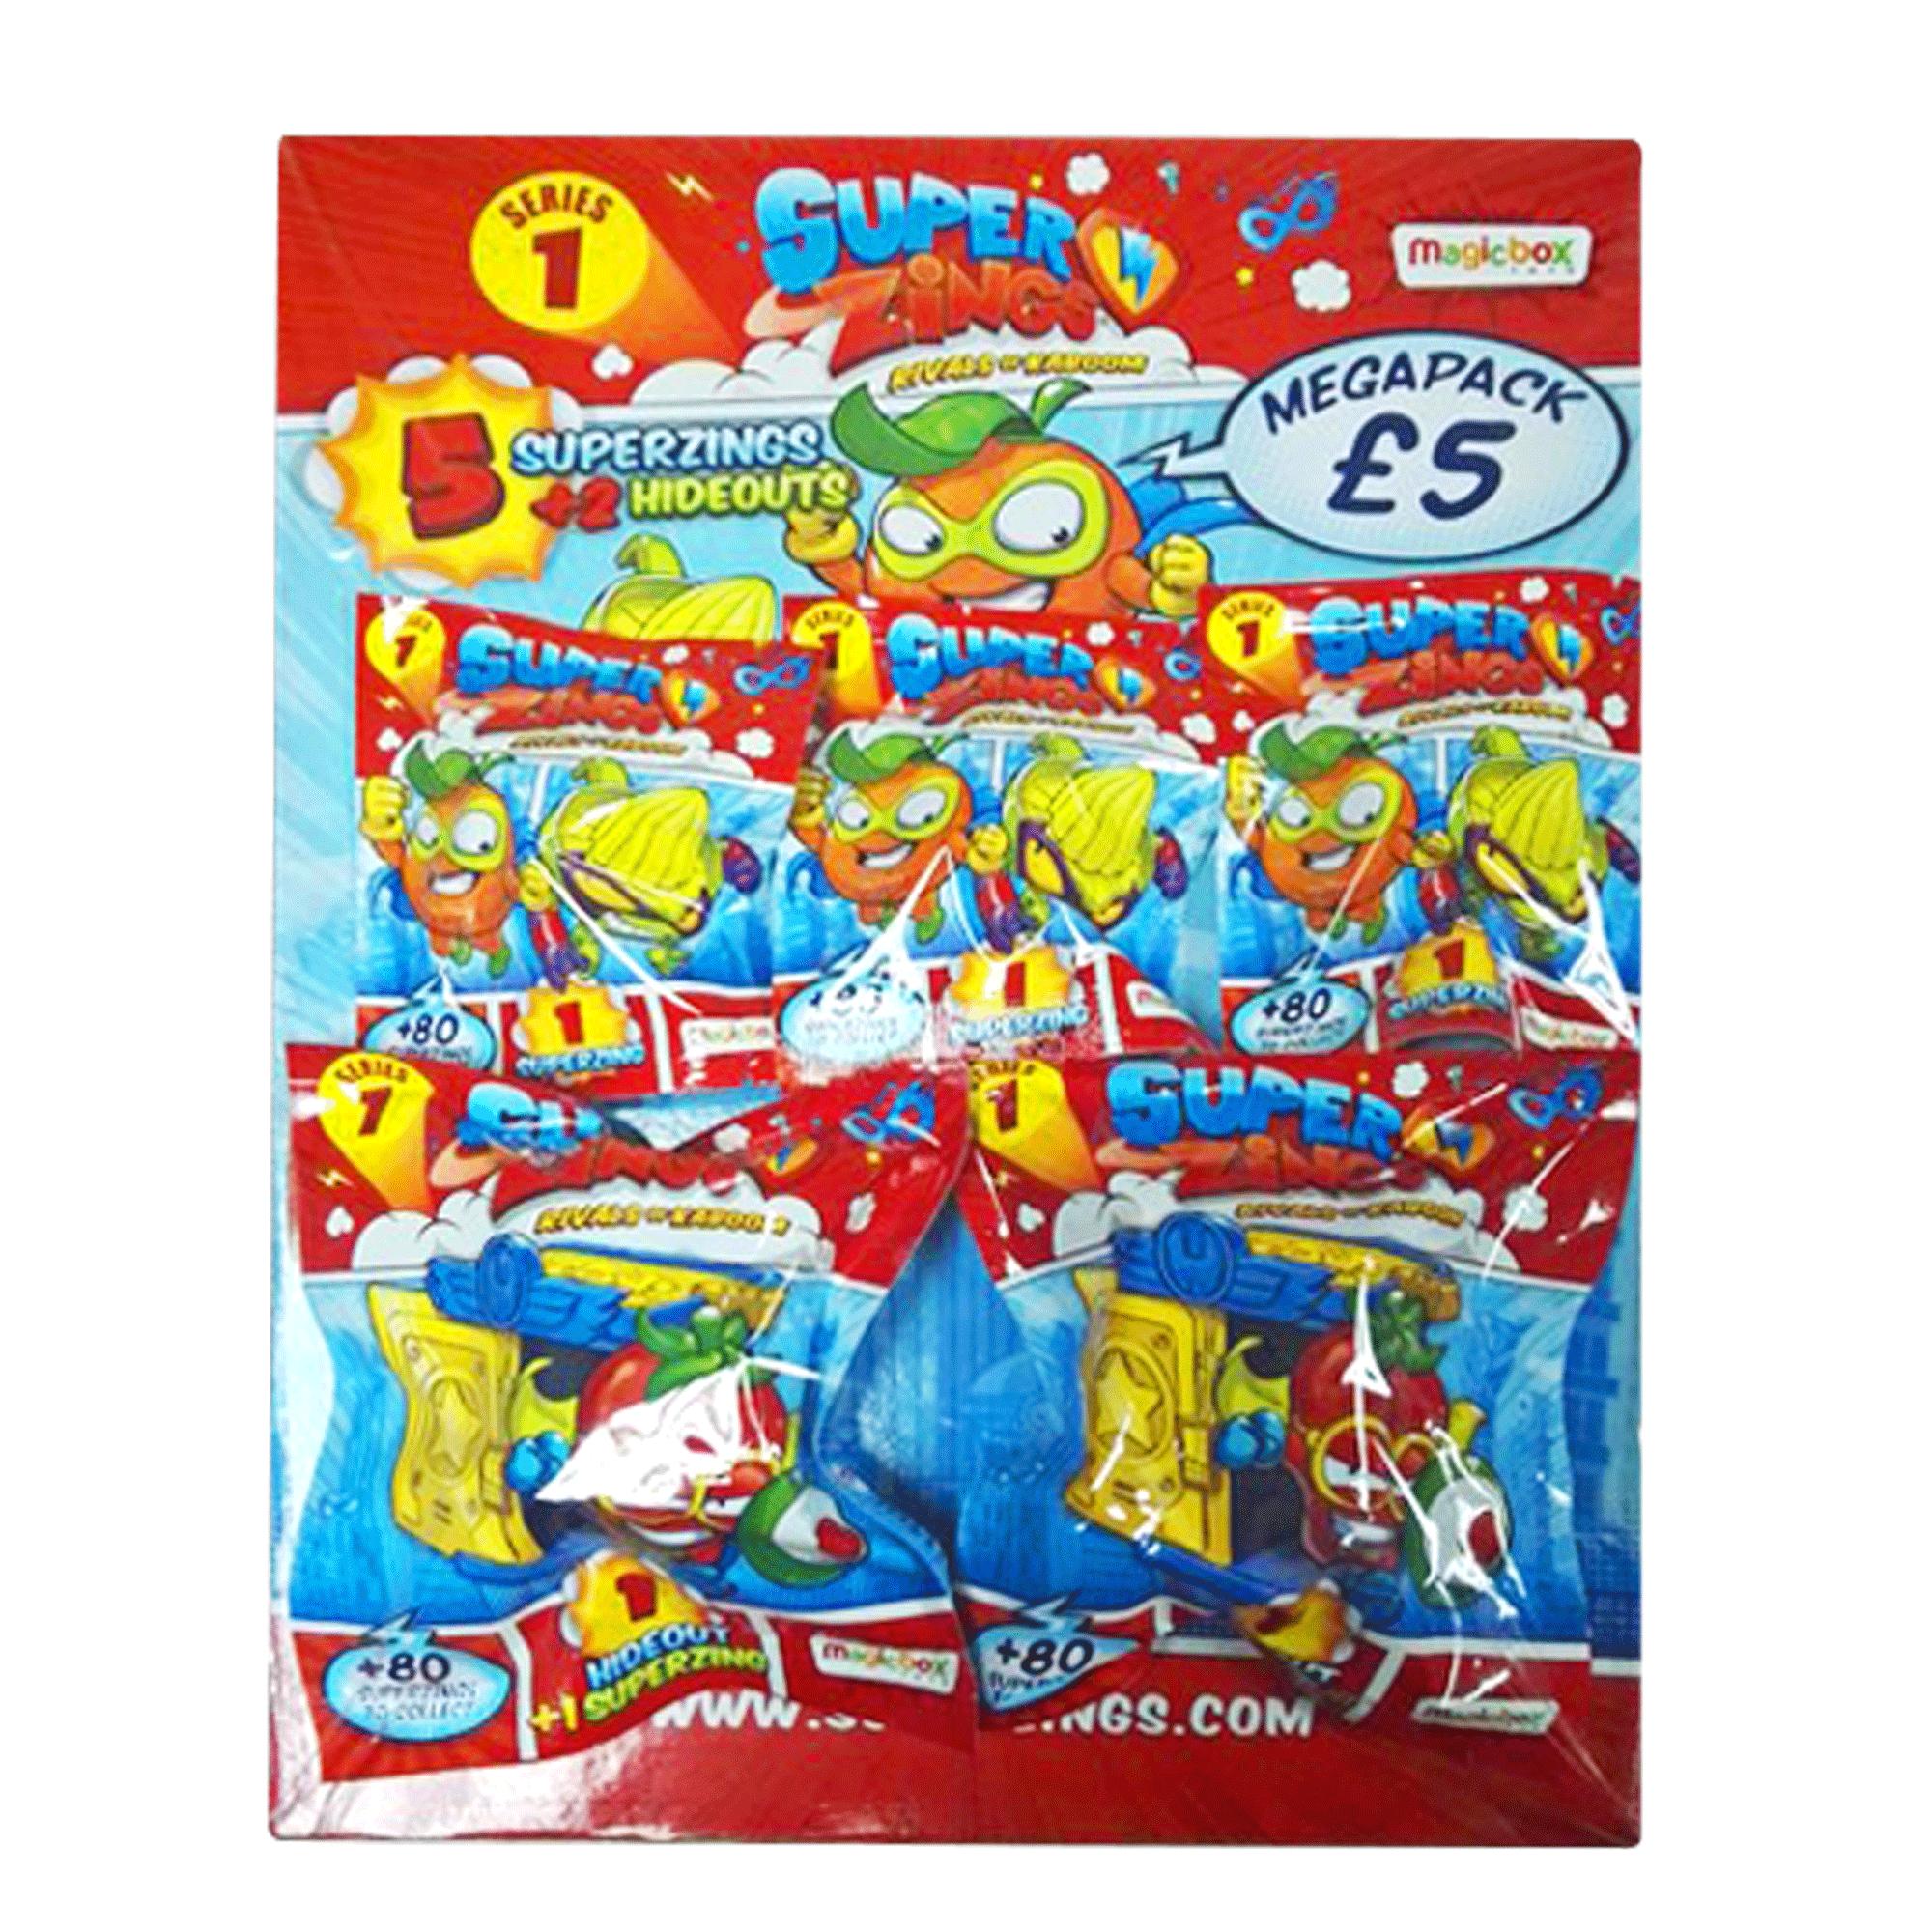 UK European Wholesale Toys Squishies Squishy Squeeze Kawaii Slow Rising Soft Toys New Craze ...